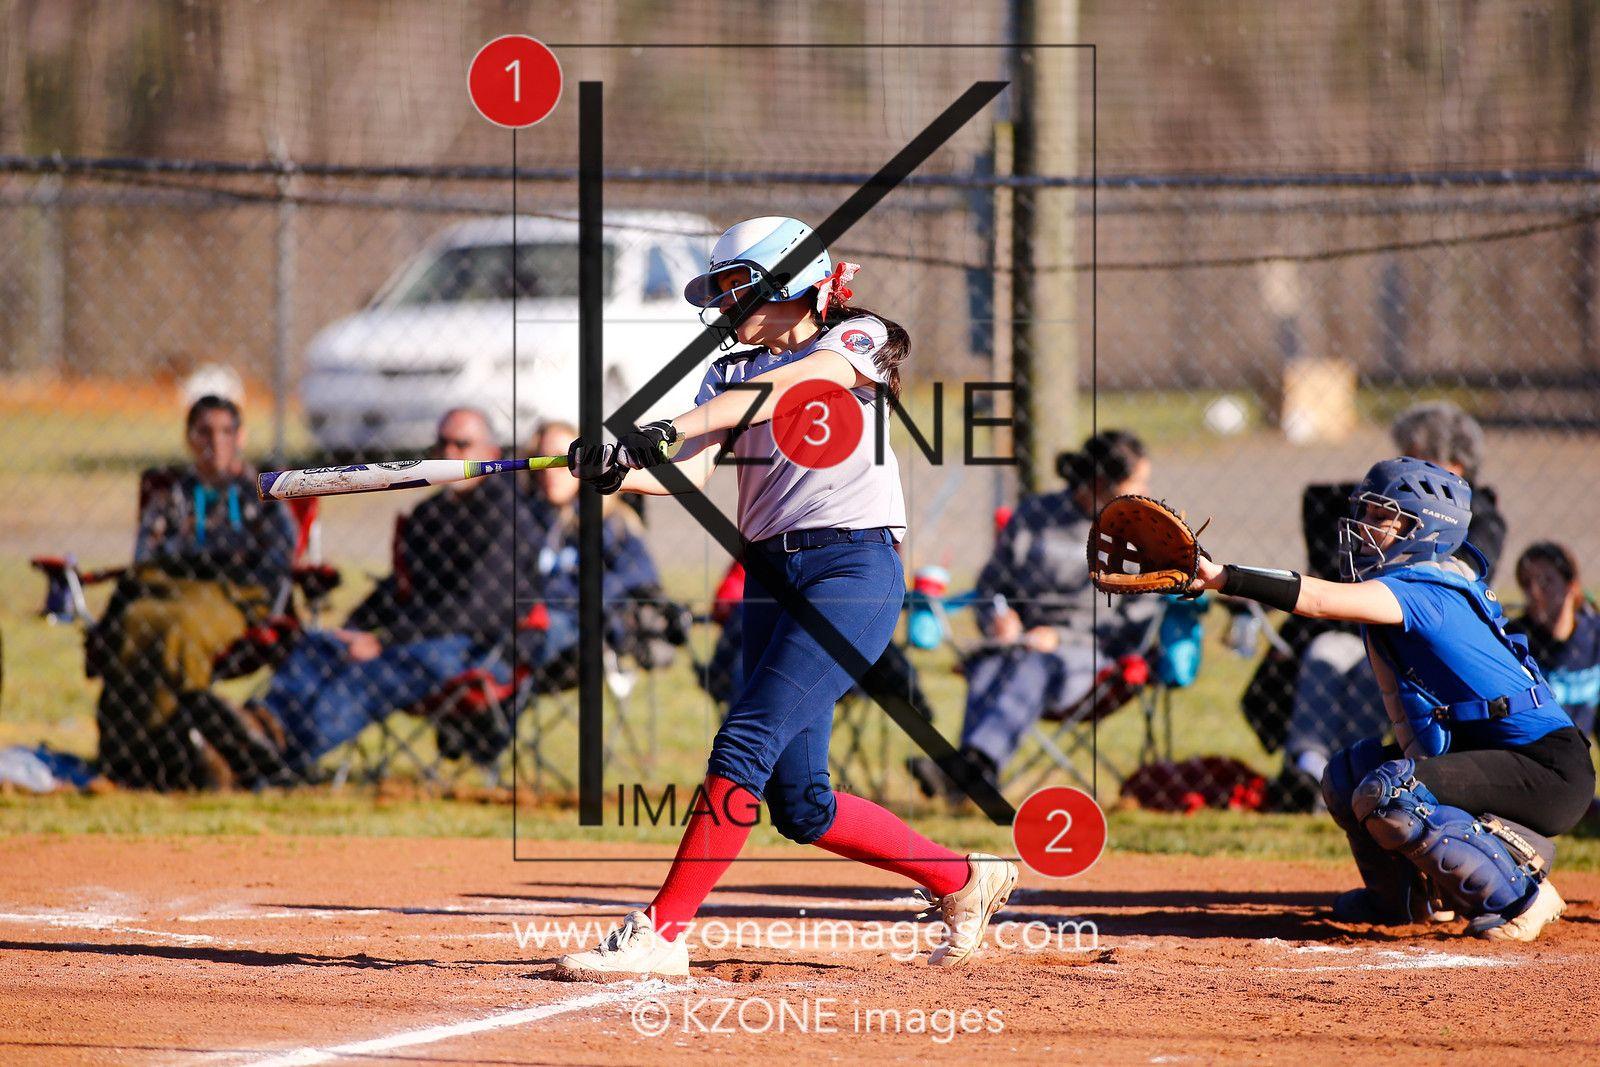 Mcmichael Magna Vista Varsity 3 22 17 Kzone Images Softball High School Sports